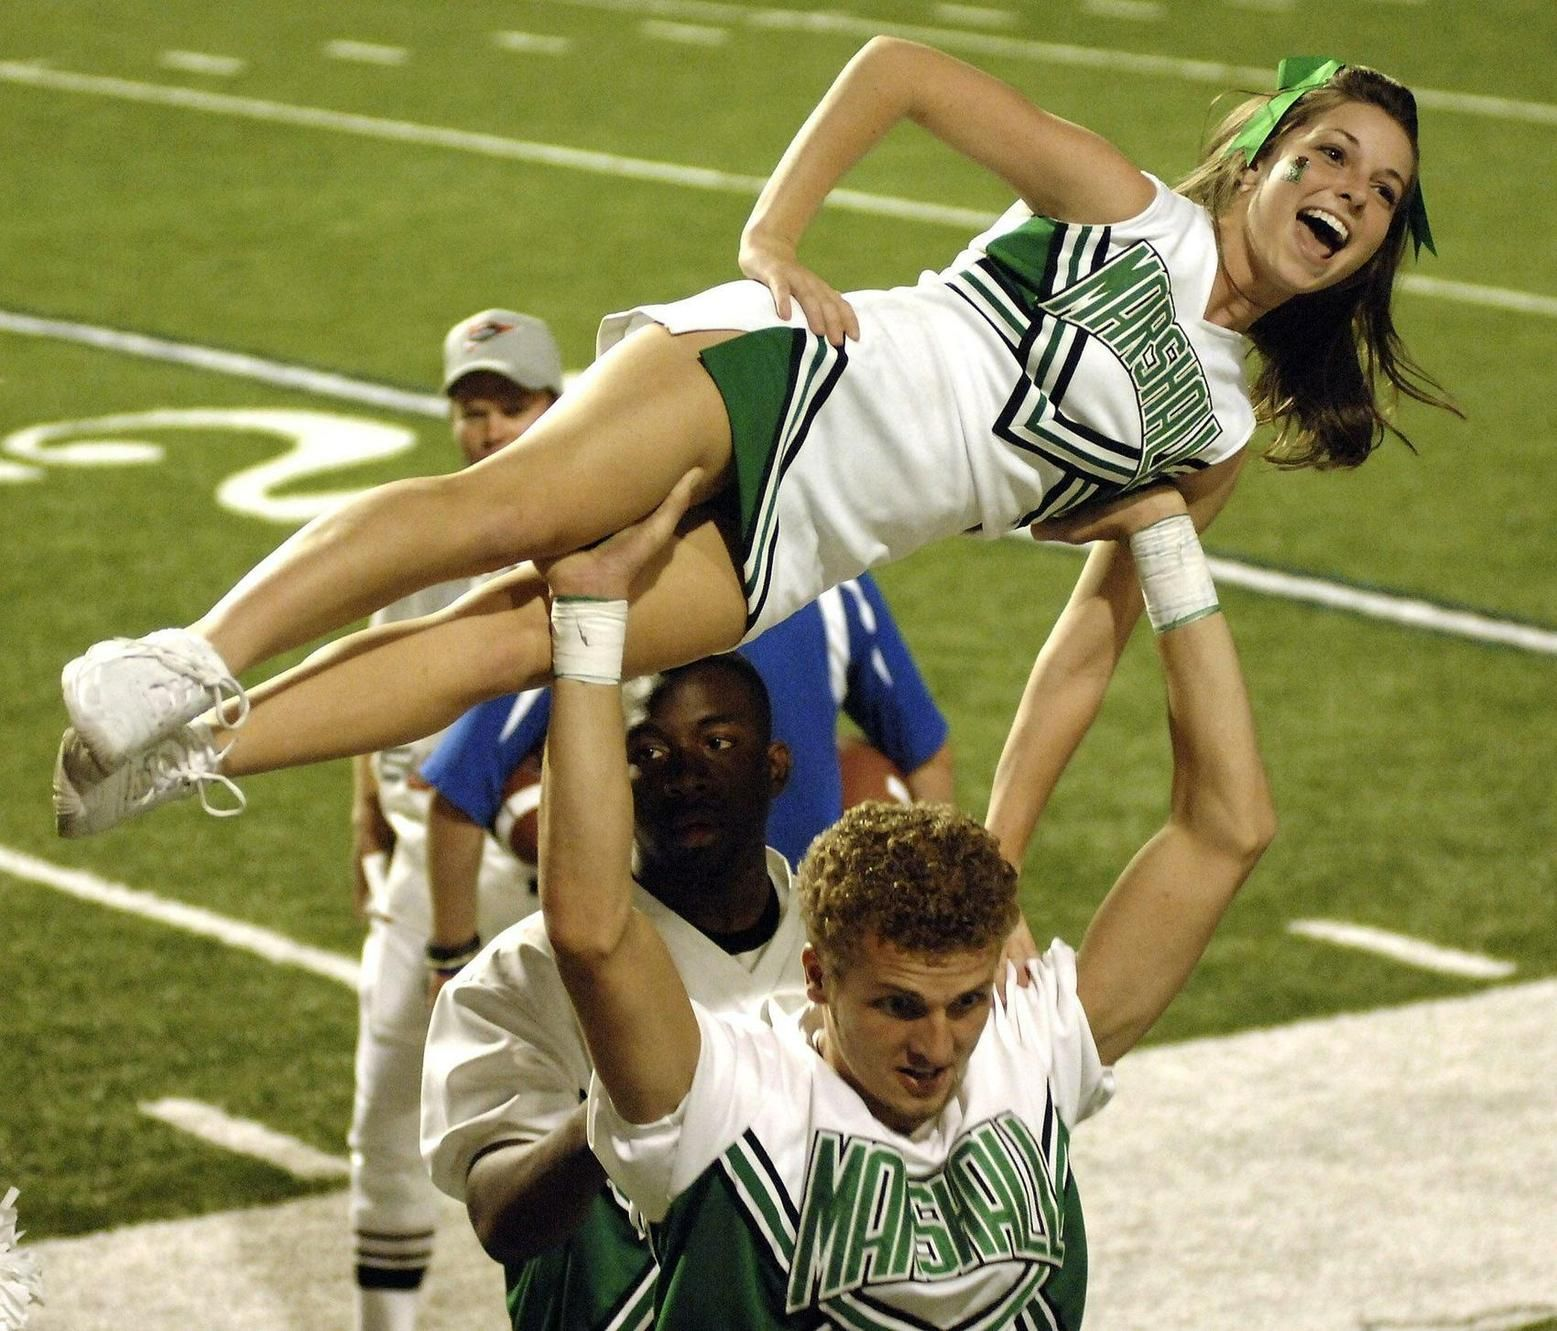 marshallu Photo Keywords: cheerleader